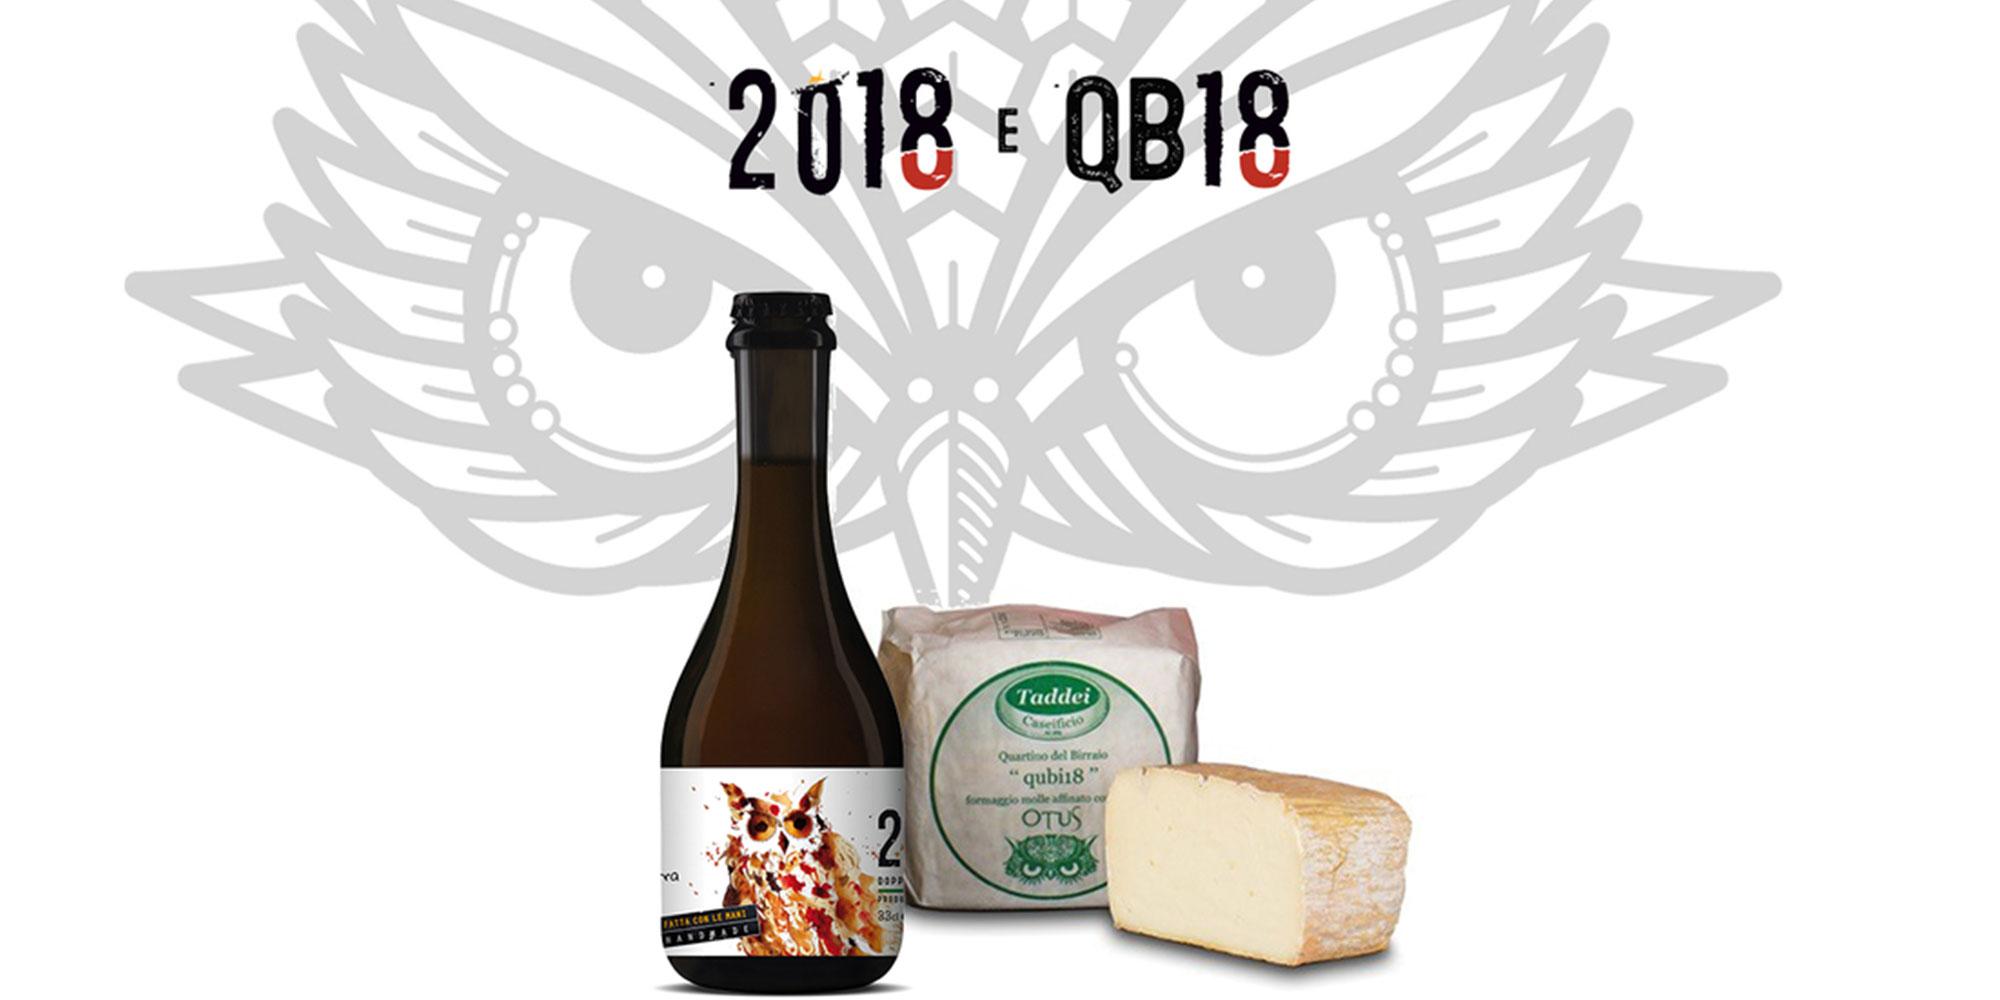 otus-limited-edition-2018